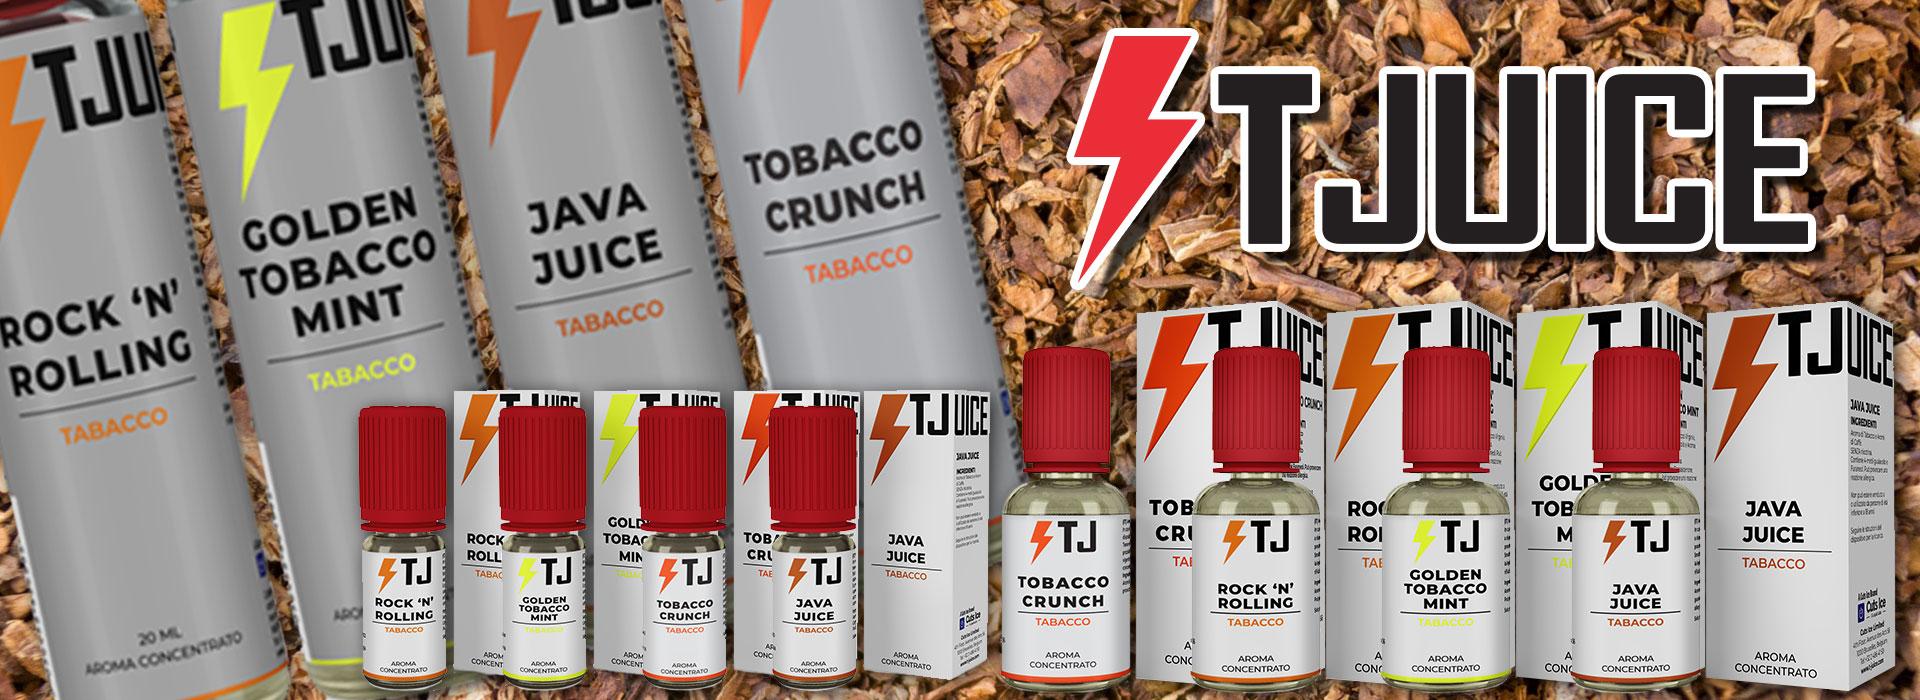 Tobacco Rocks